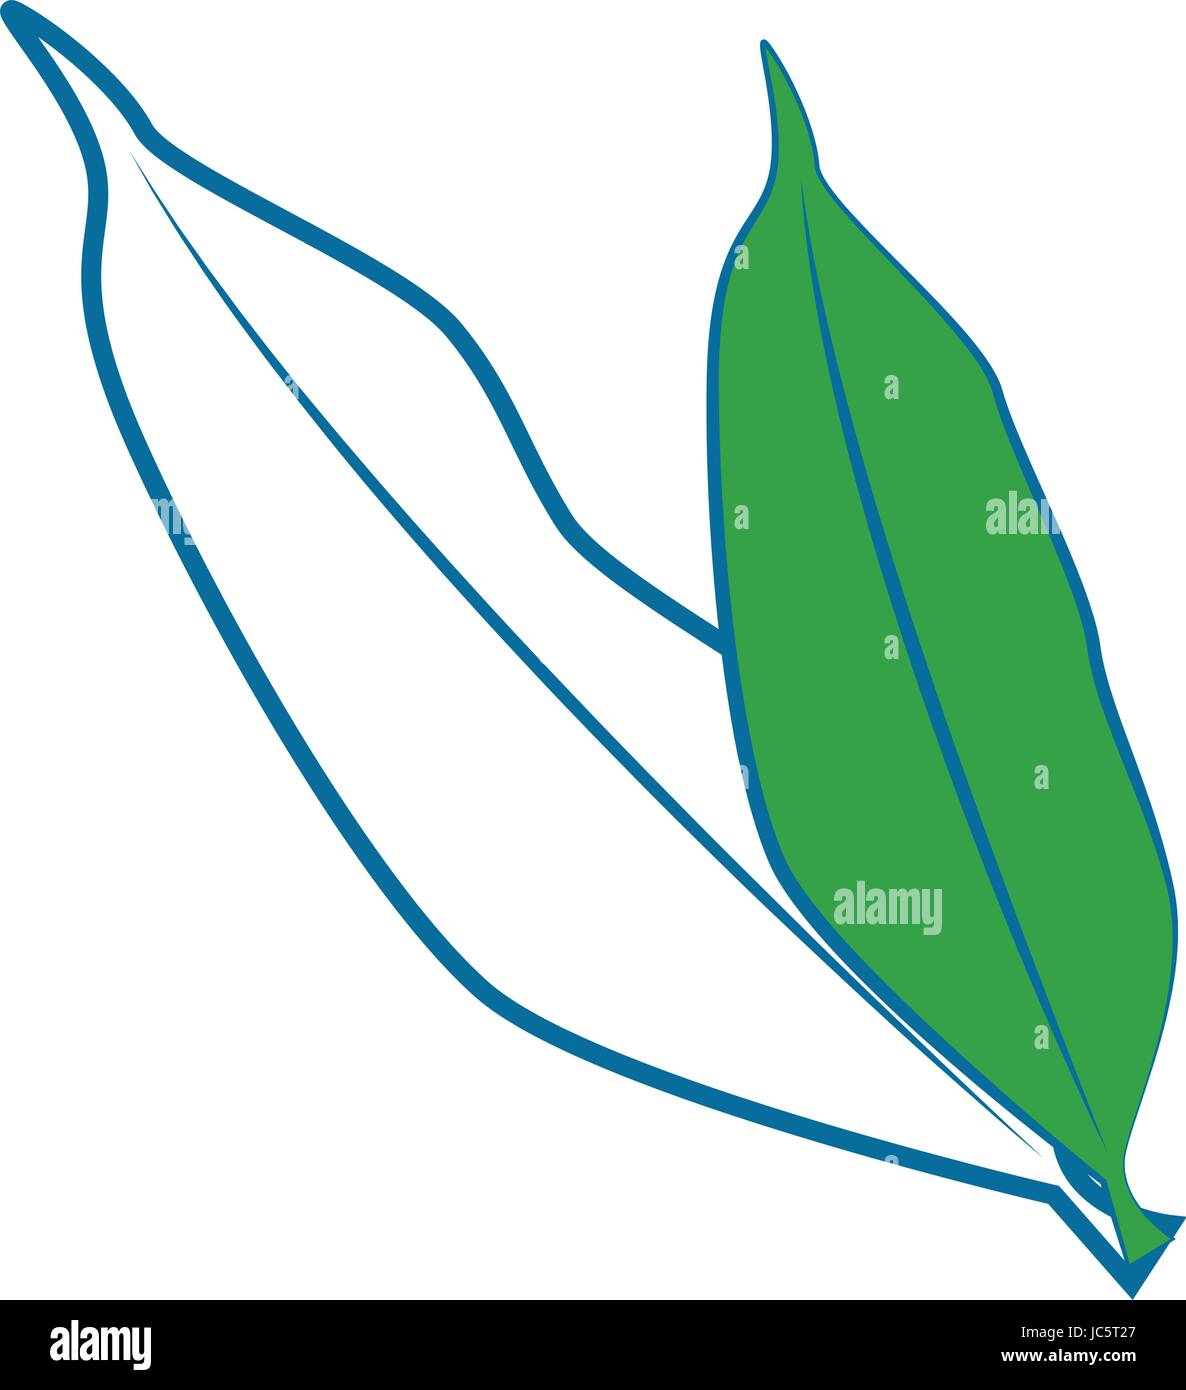 Fruit leaves isolated - Stock Image